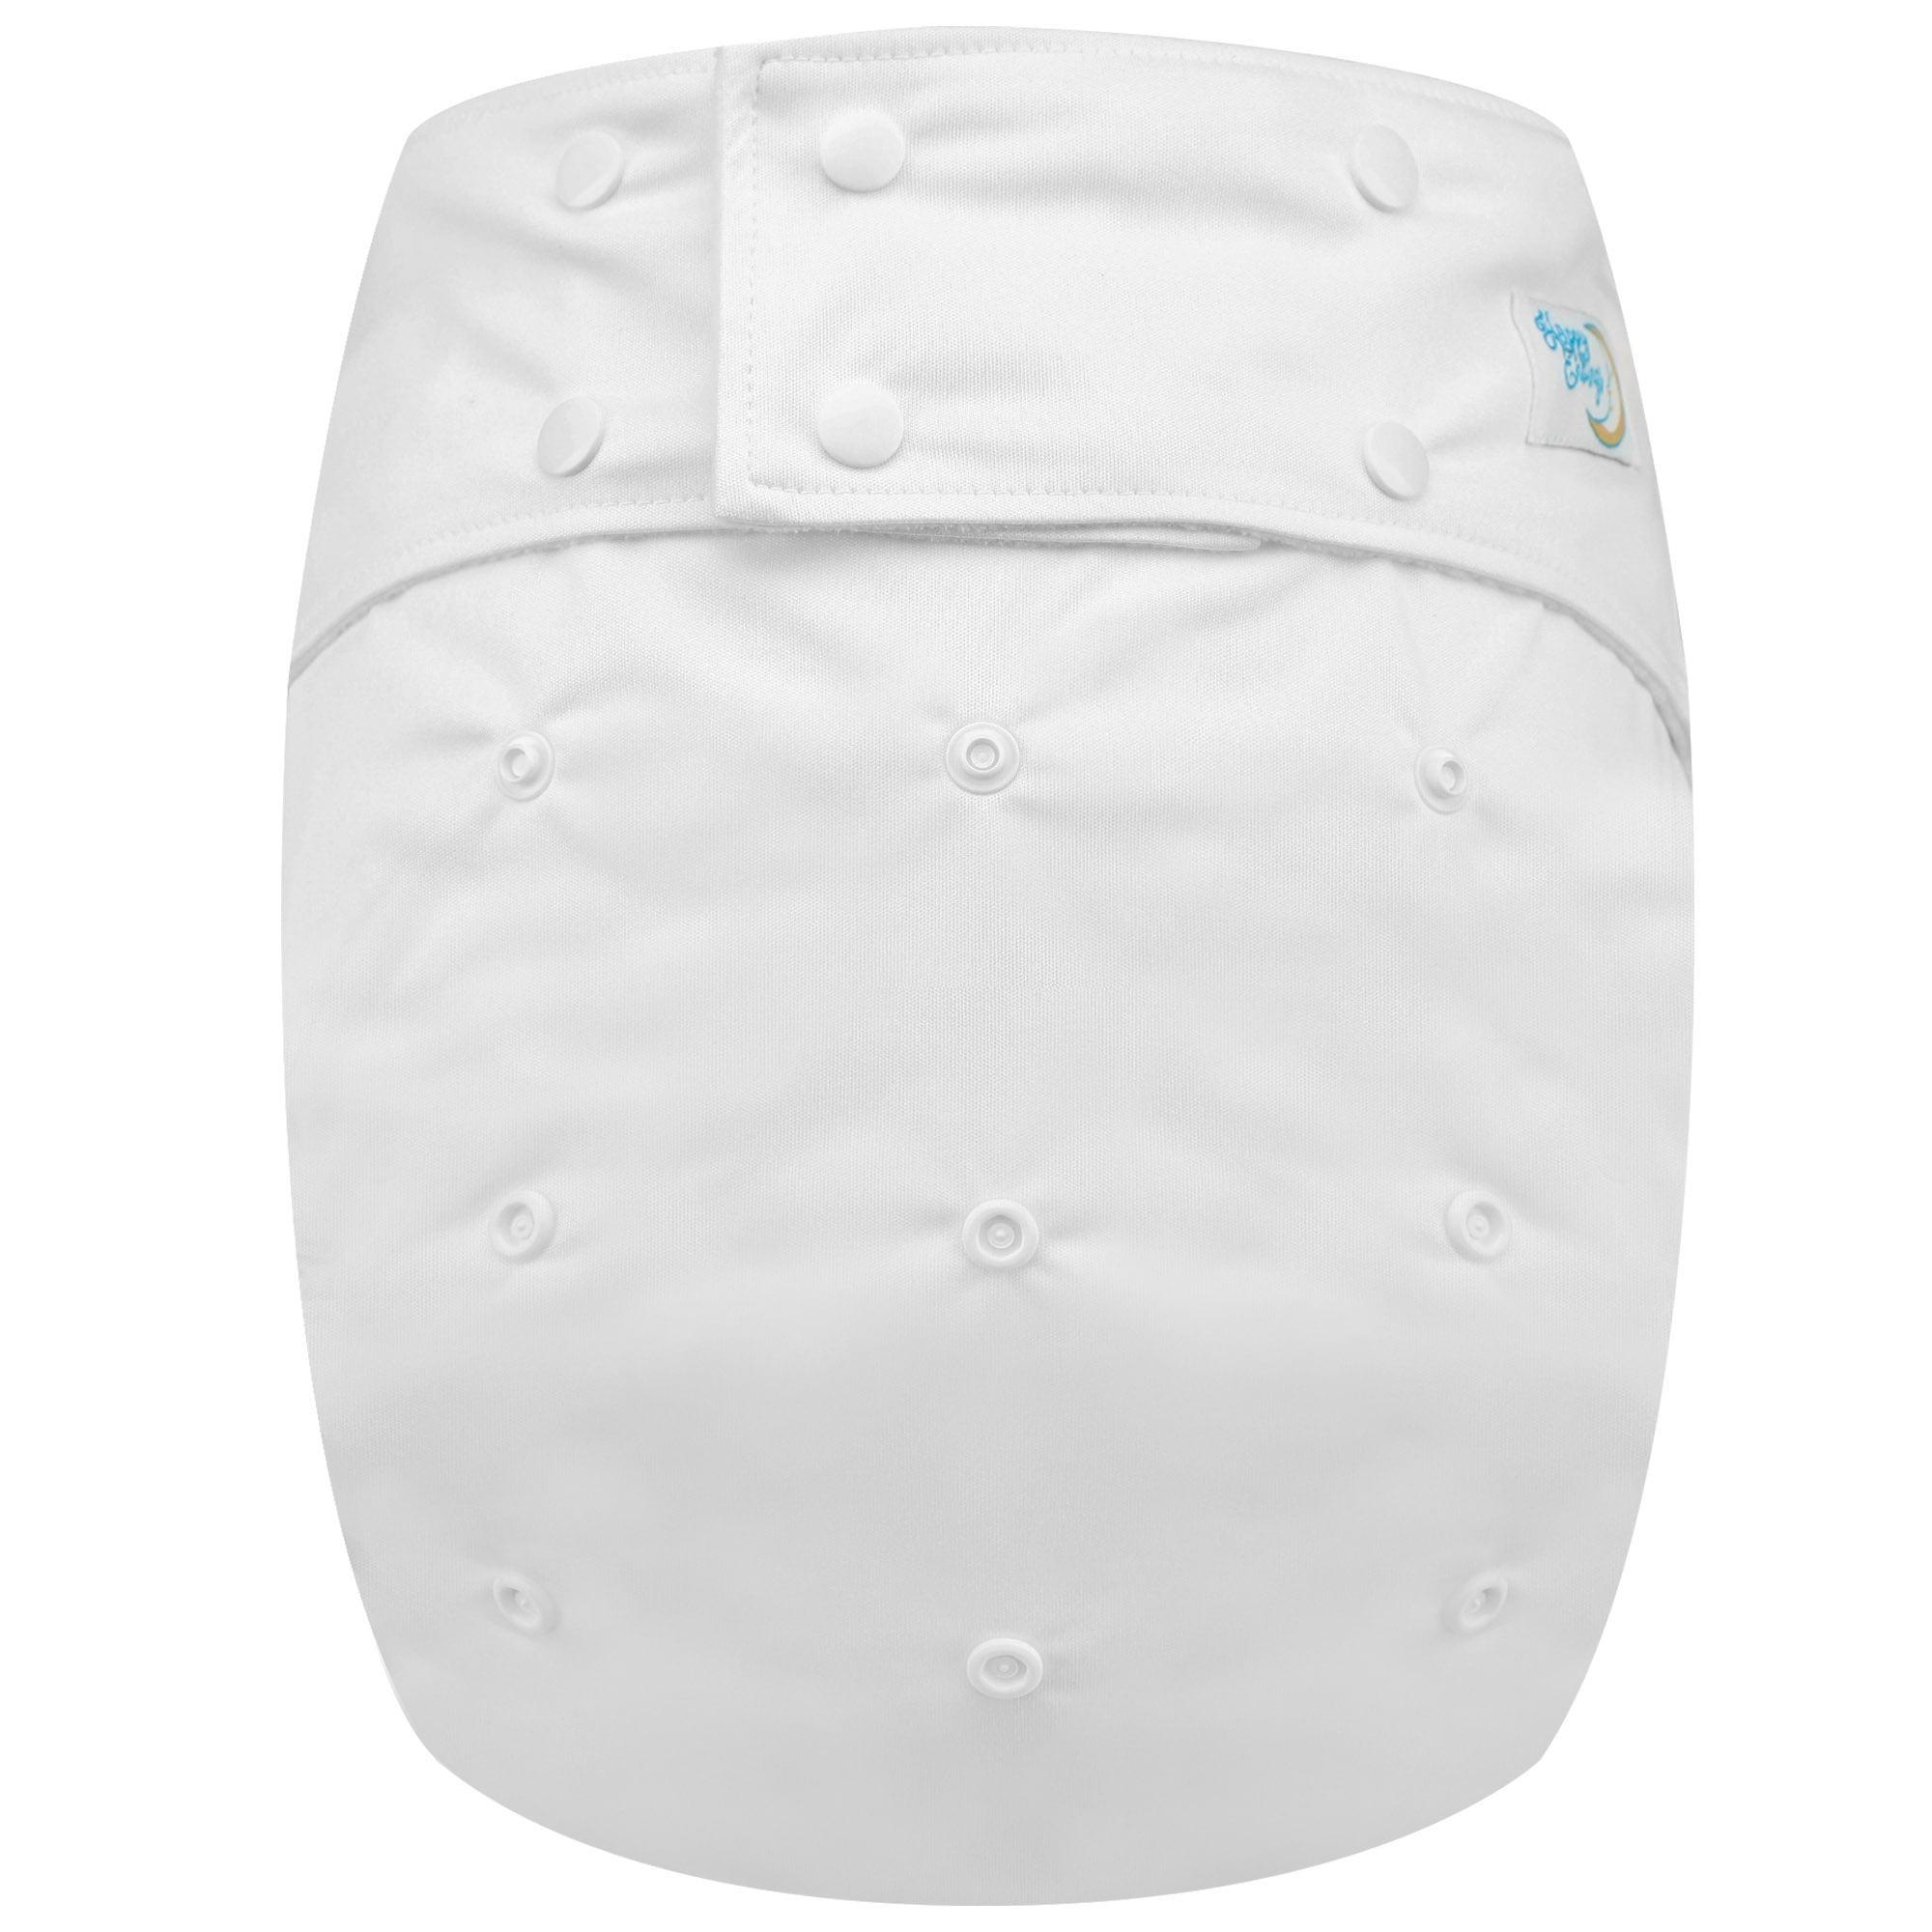 Happy Endings Teen / Adult Reusable Incontinence Cloth Diaper (White) -  Walmart.com